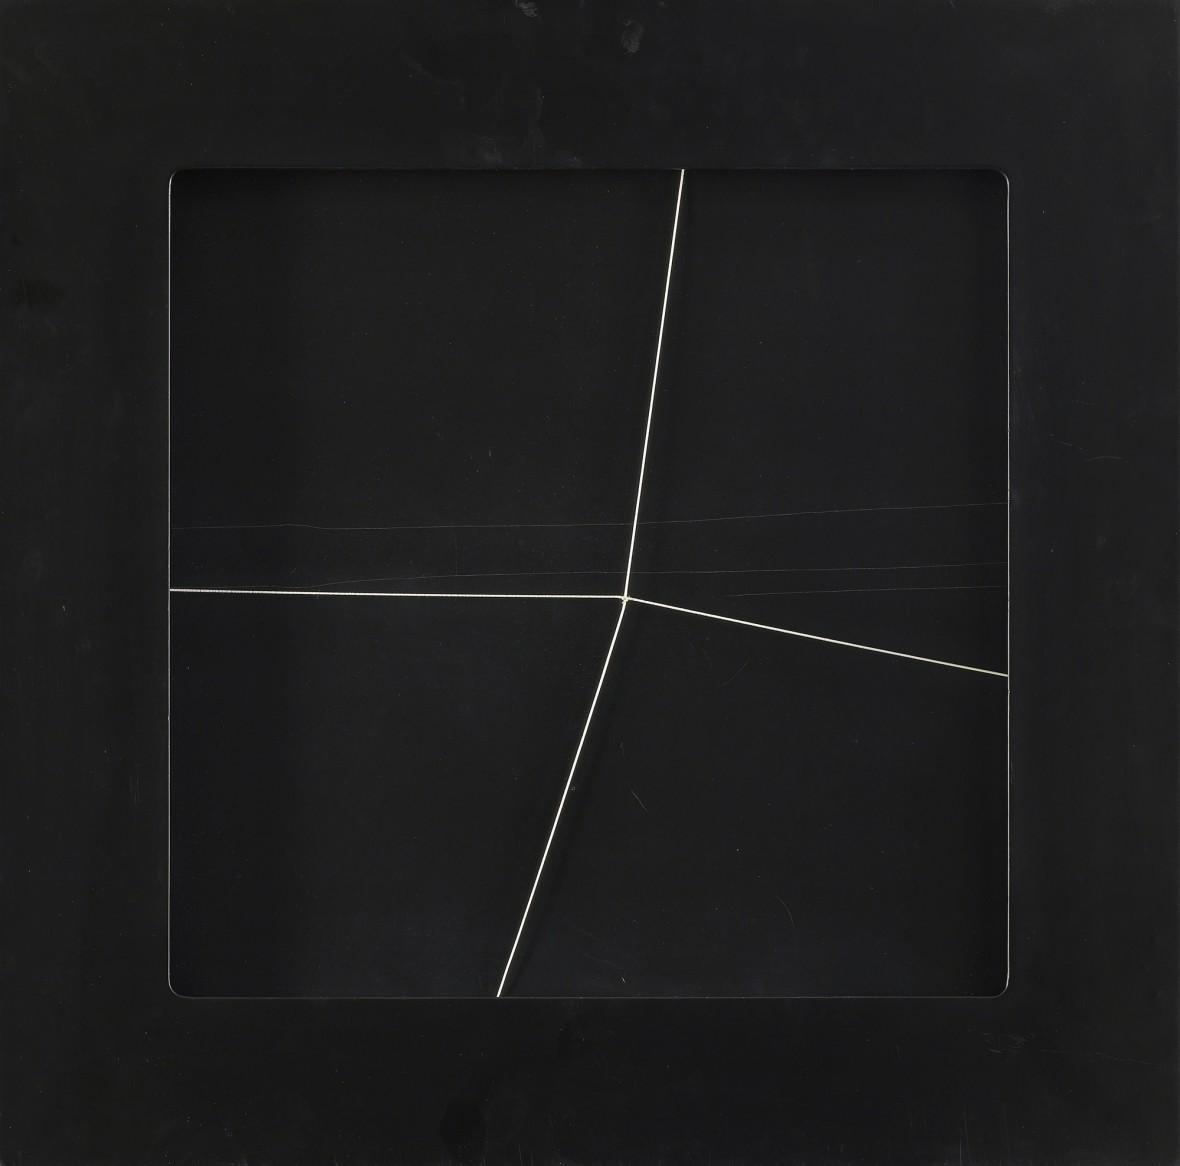 <p><b>Gianni Colombo,</b><i>Spazio elastico - Superficie (Elastic Space -Surface)</i>, 1972-74</p><p></p>